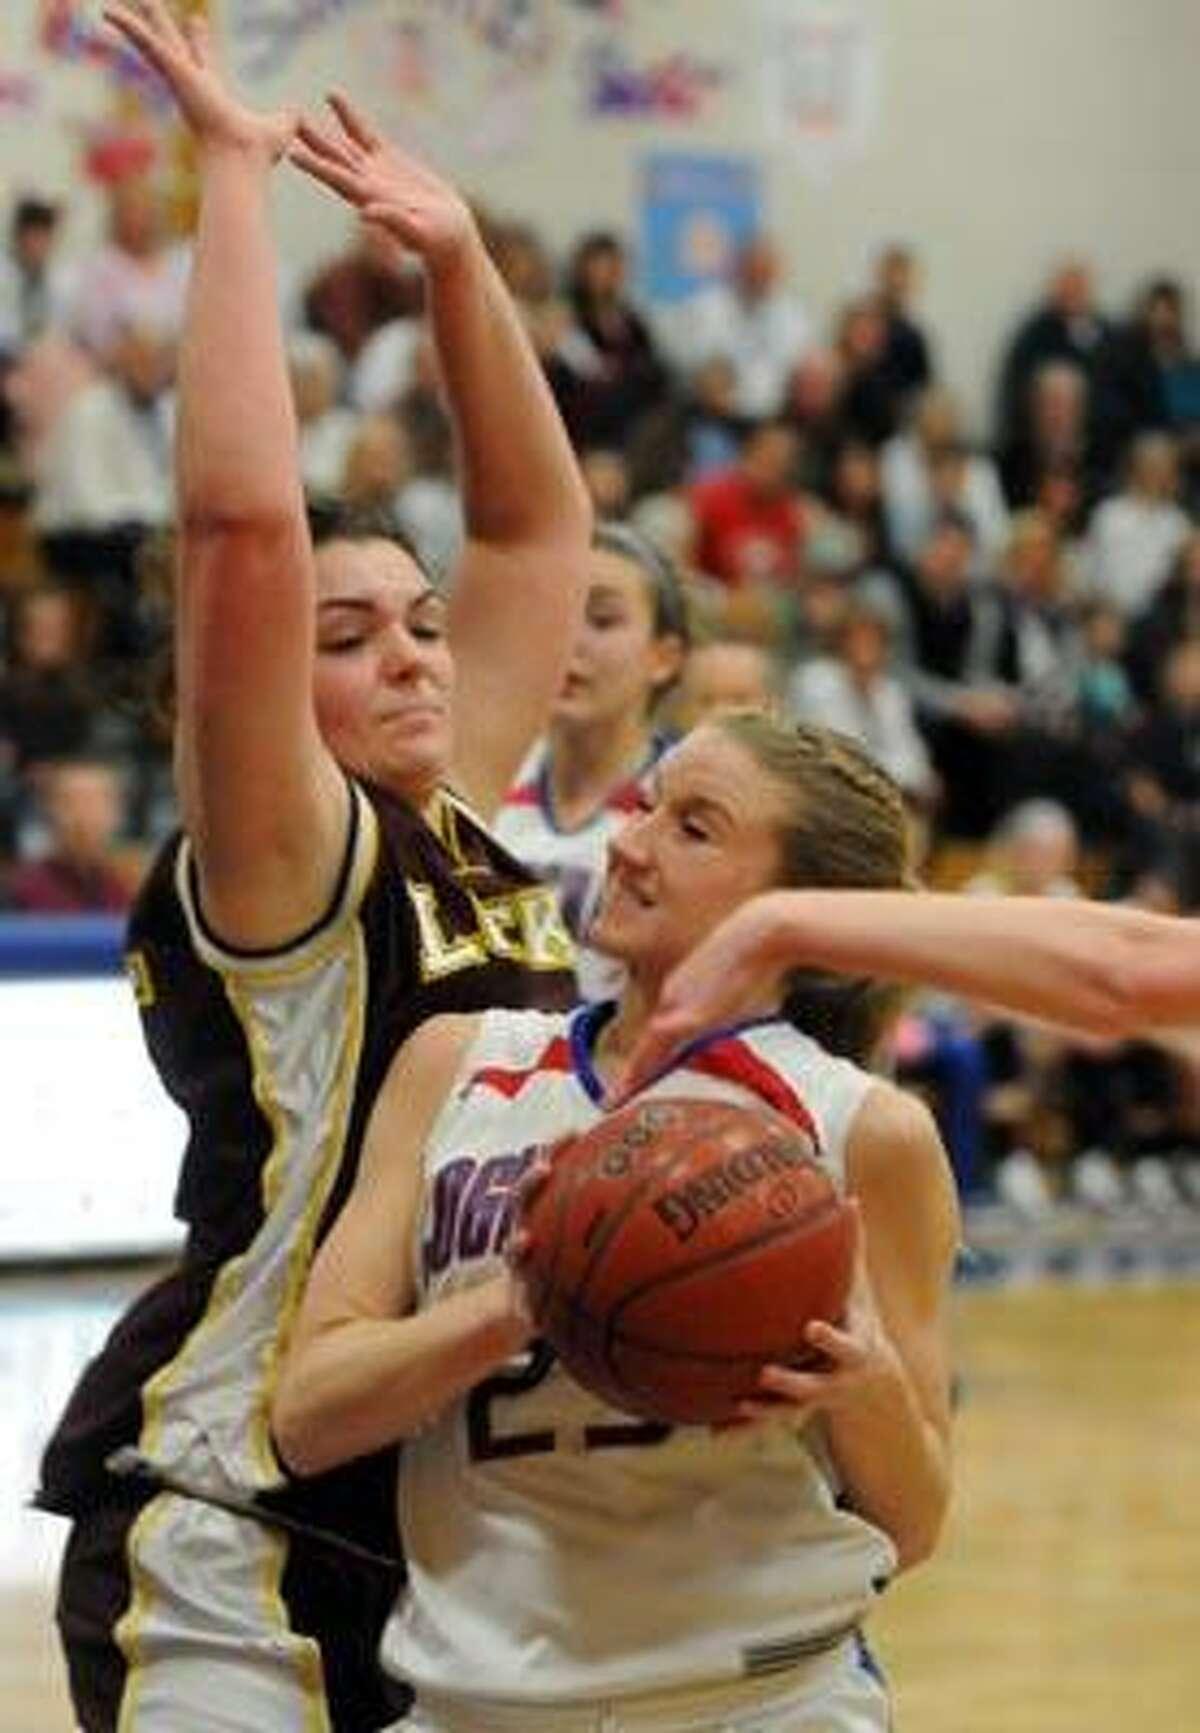 Class S girls basketball tournament, Windsor Locks at Coginchaug (Durham), second quarter. Windsor Locks' Nikki LaPierre left and Coginchaug's Amanda Boyle. Photo by Mara Lavitt/New Haven Register3/3/11